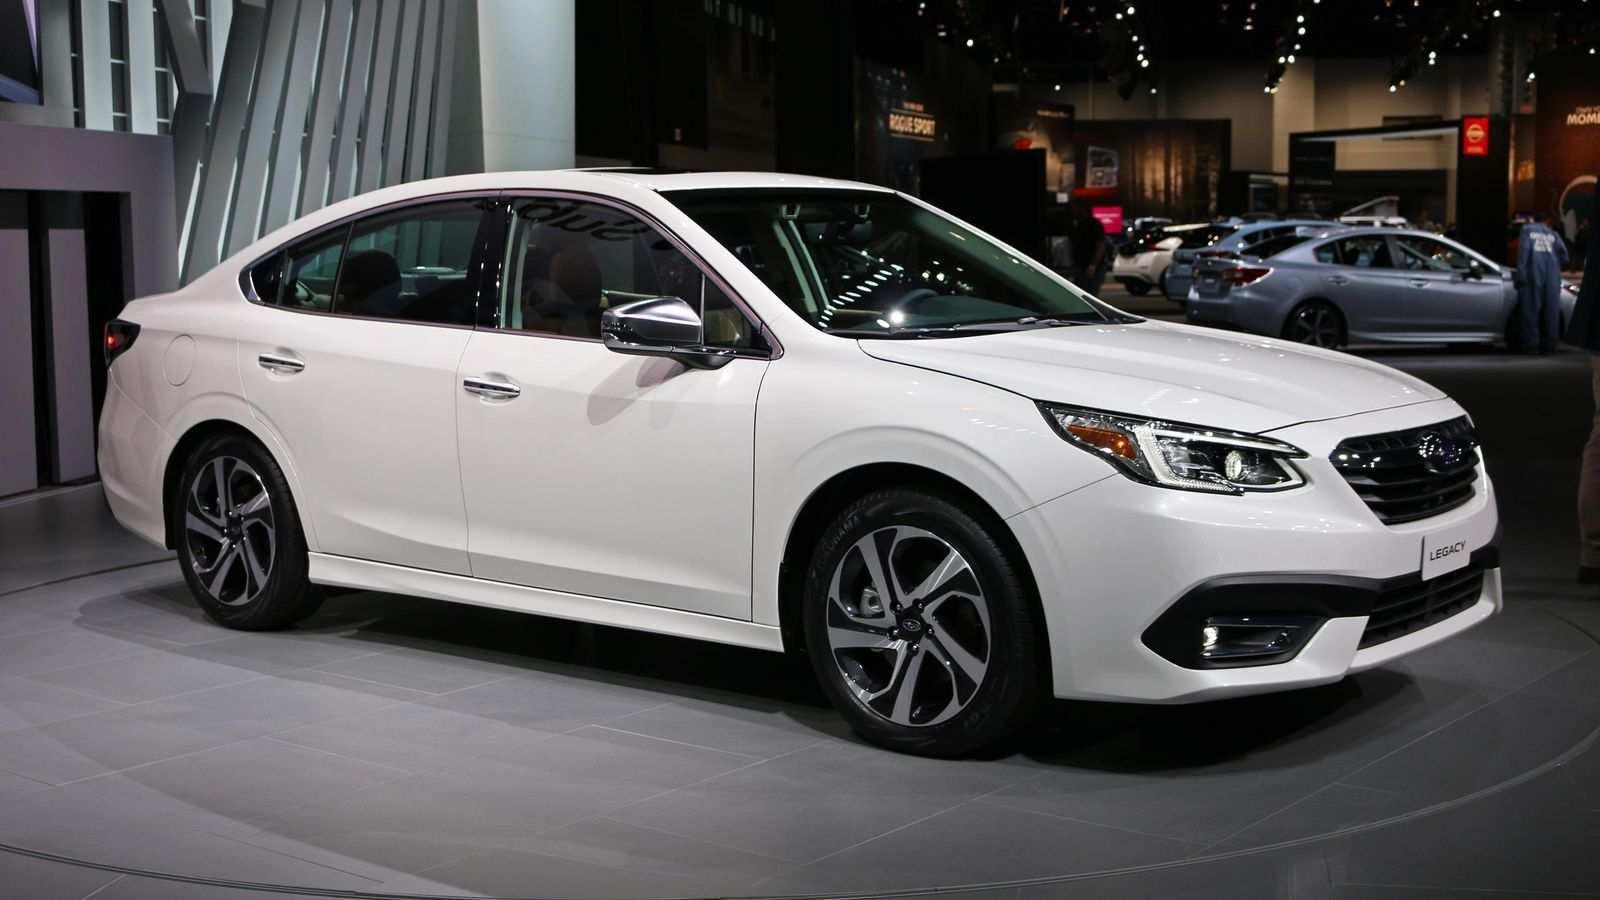 20 New 2020 Subaru Legacy Redesign for 2020 Subaru Legacy